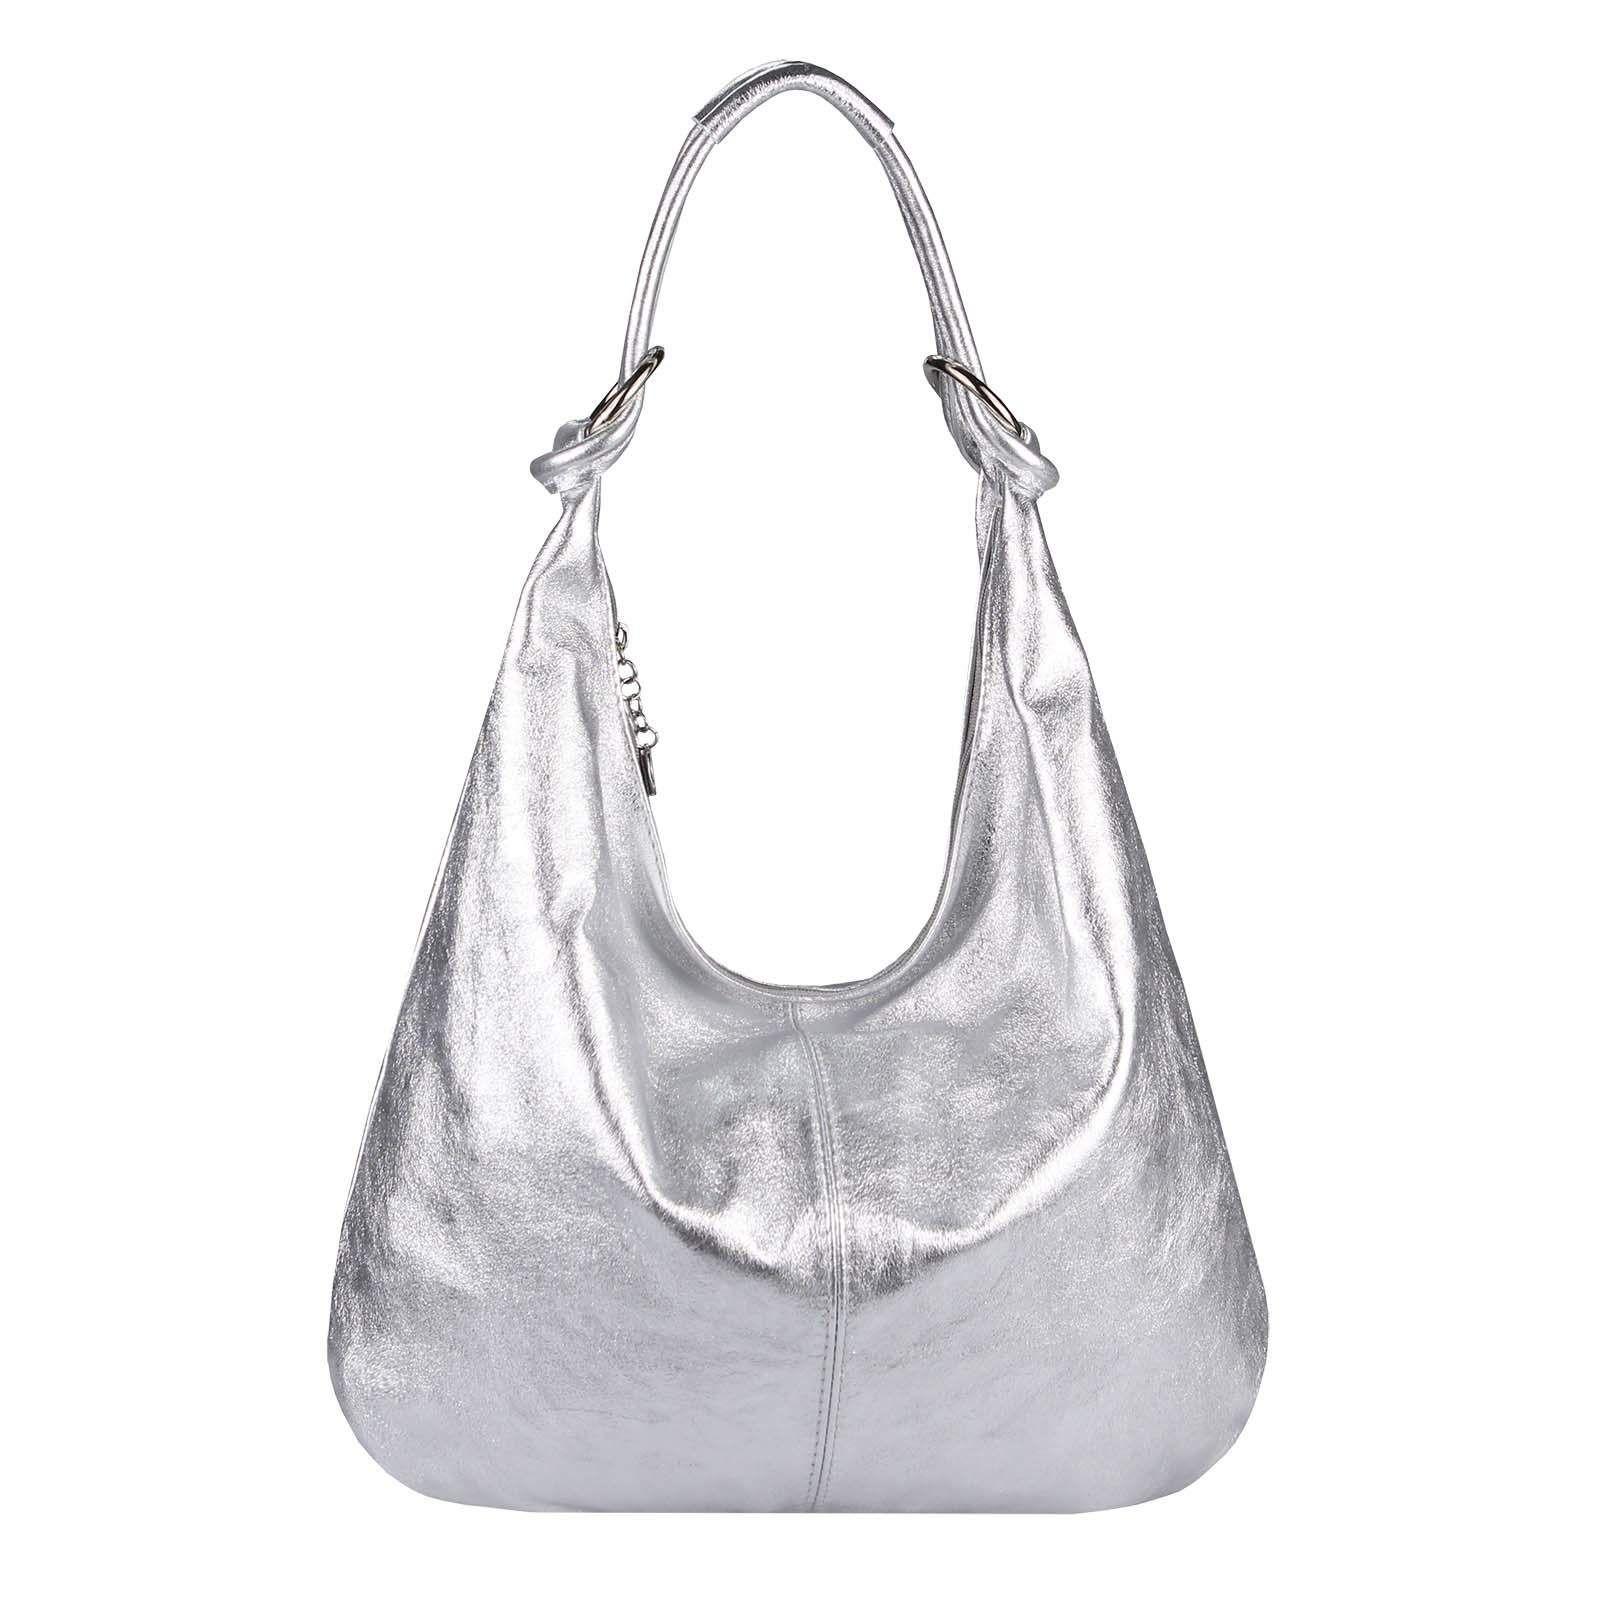 ffba9608cd470f ITALY DAMEN Echt LEDER TASCHE Schultertasche Handtasche Umhängetasche  Beuteltasche Metallic Bag Silber: Made in Italy Damen XXL Leder…